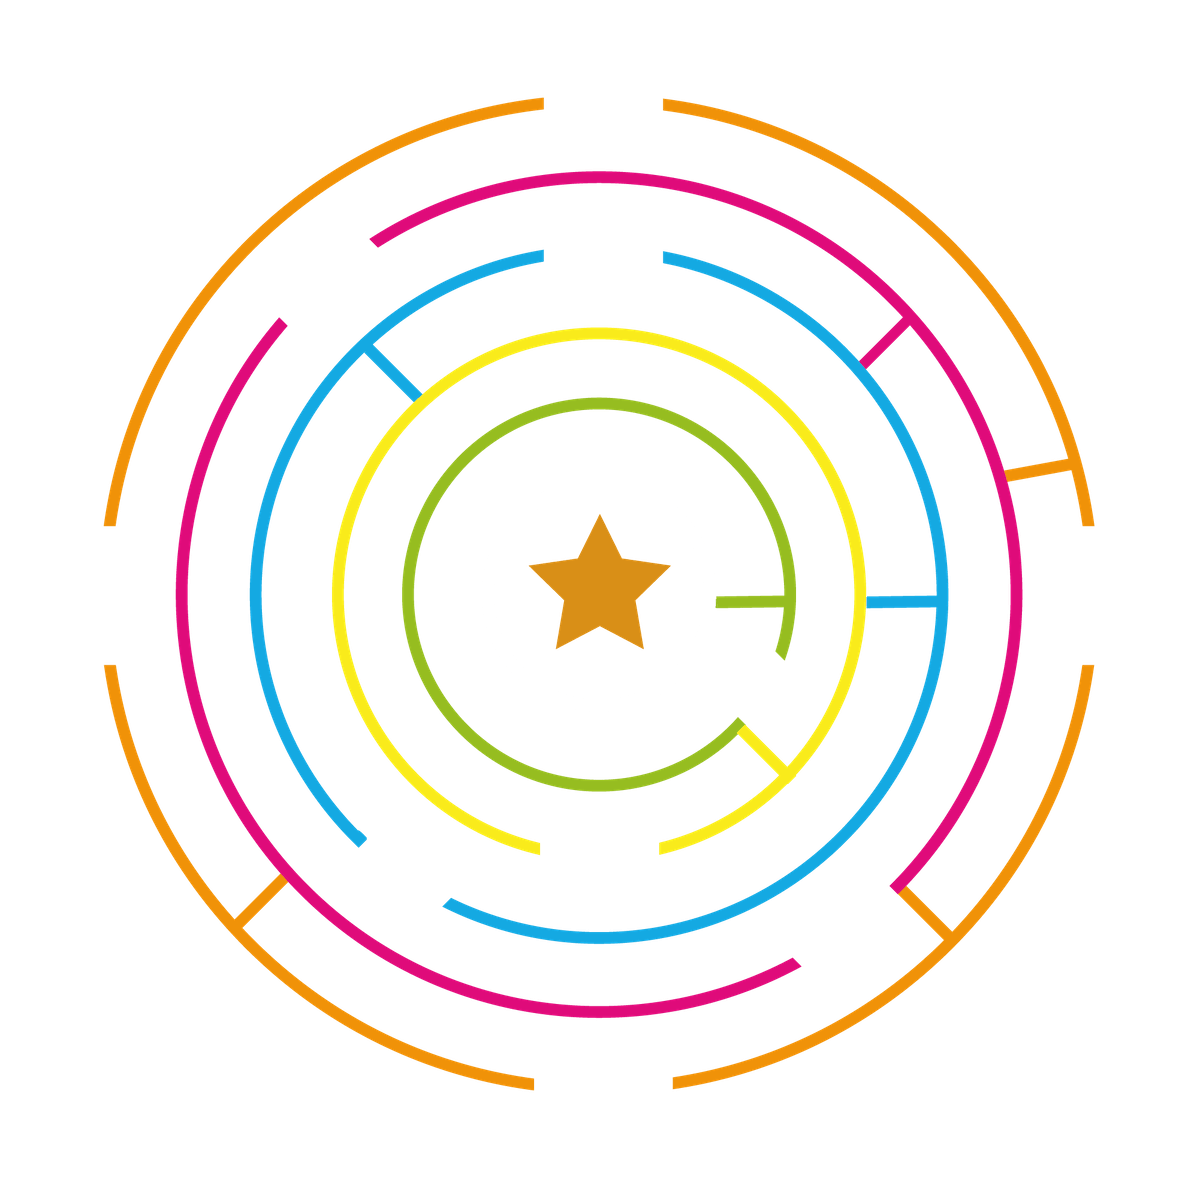 Playground Marking Circular Maze